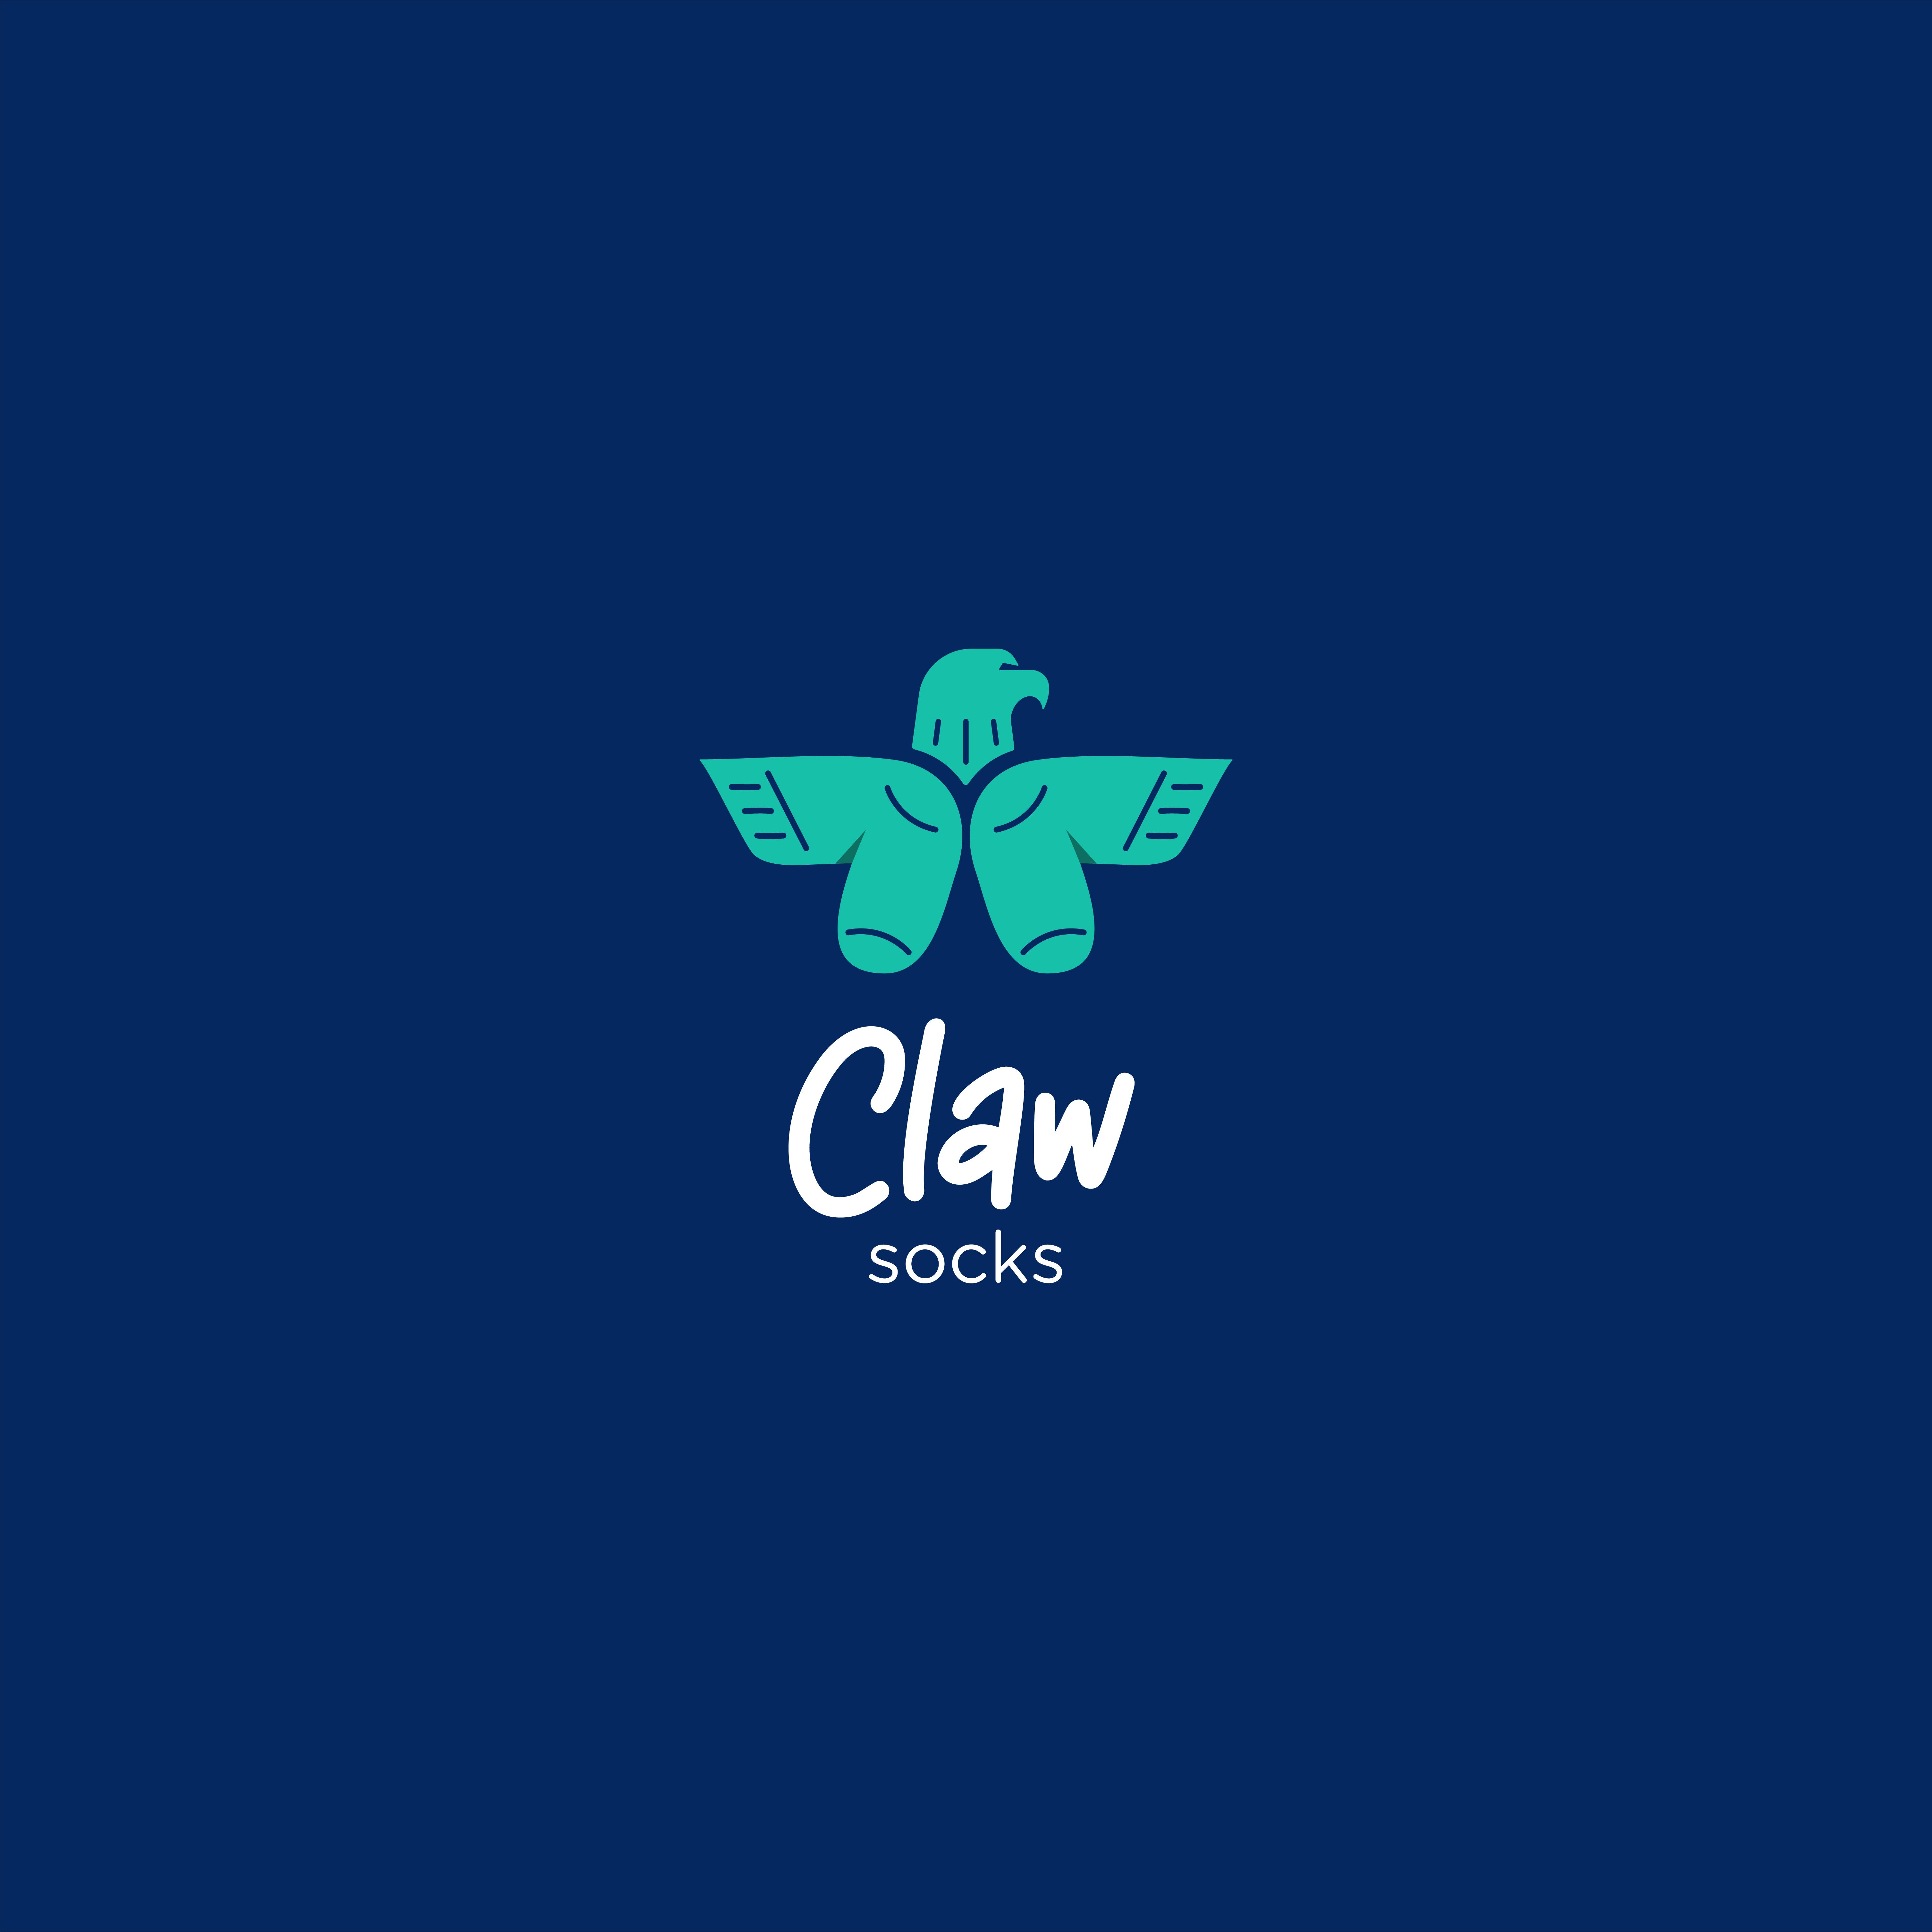 Eslam Ramzi Design Create Branding Claw Socks Brand from Saudi Arabia